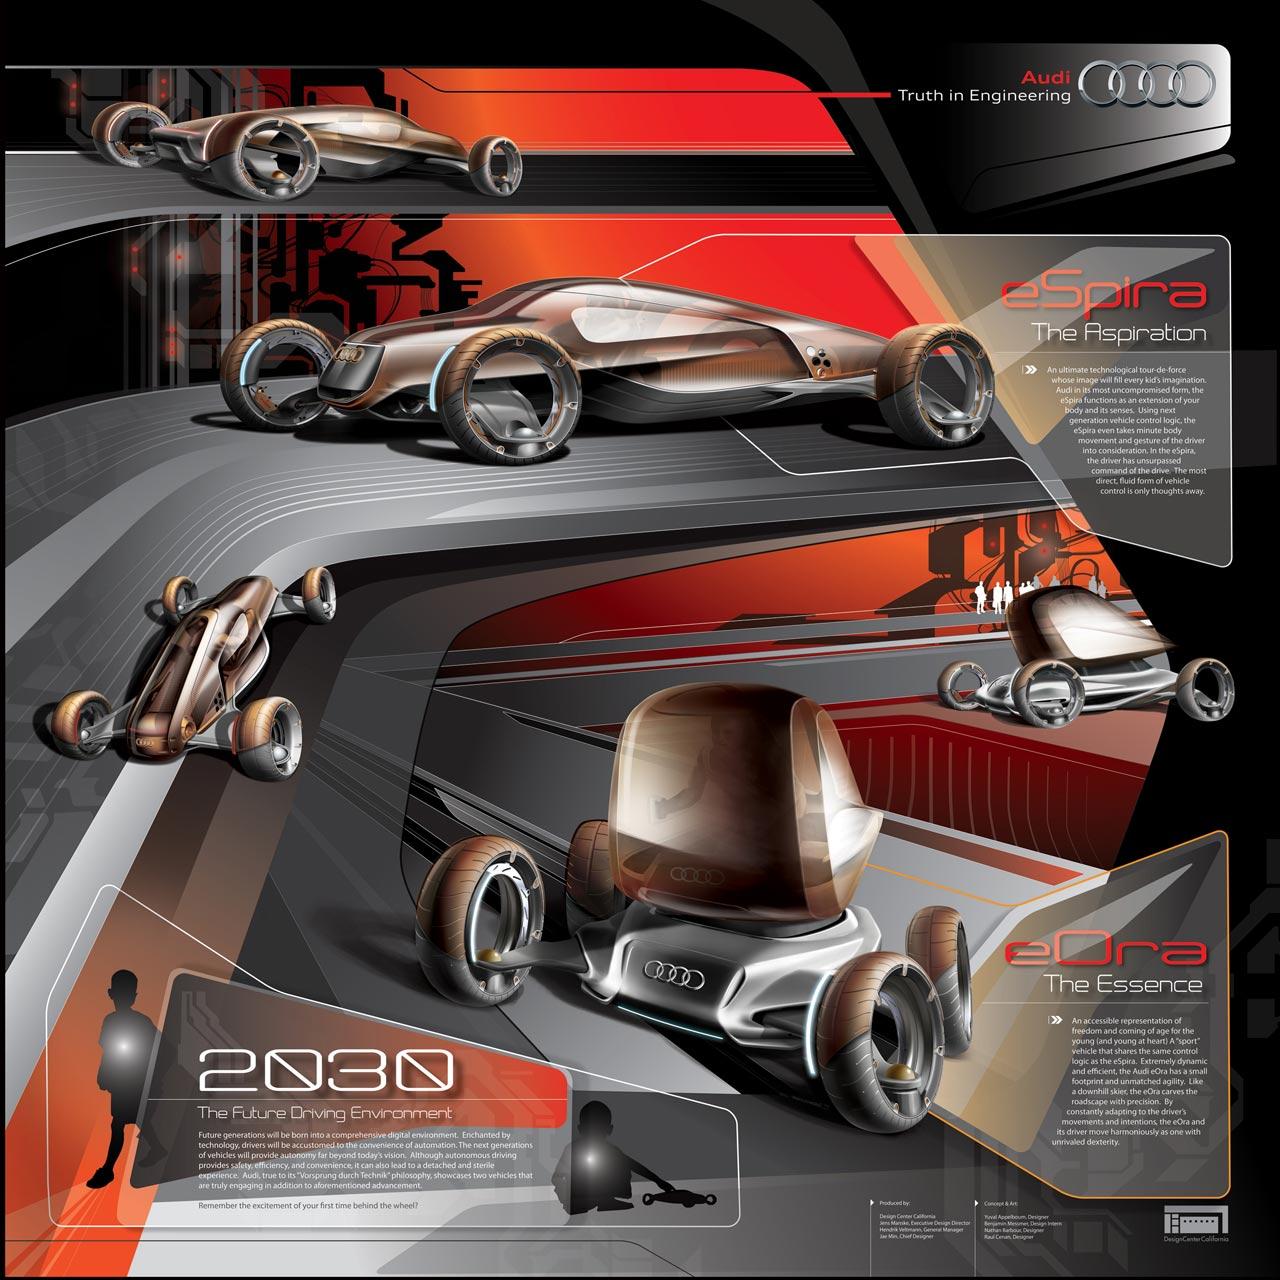 Audi eOra and eSpira